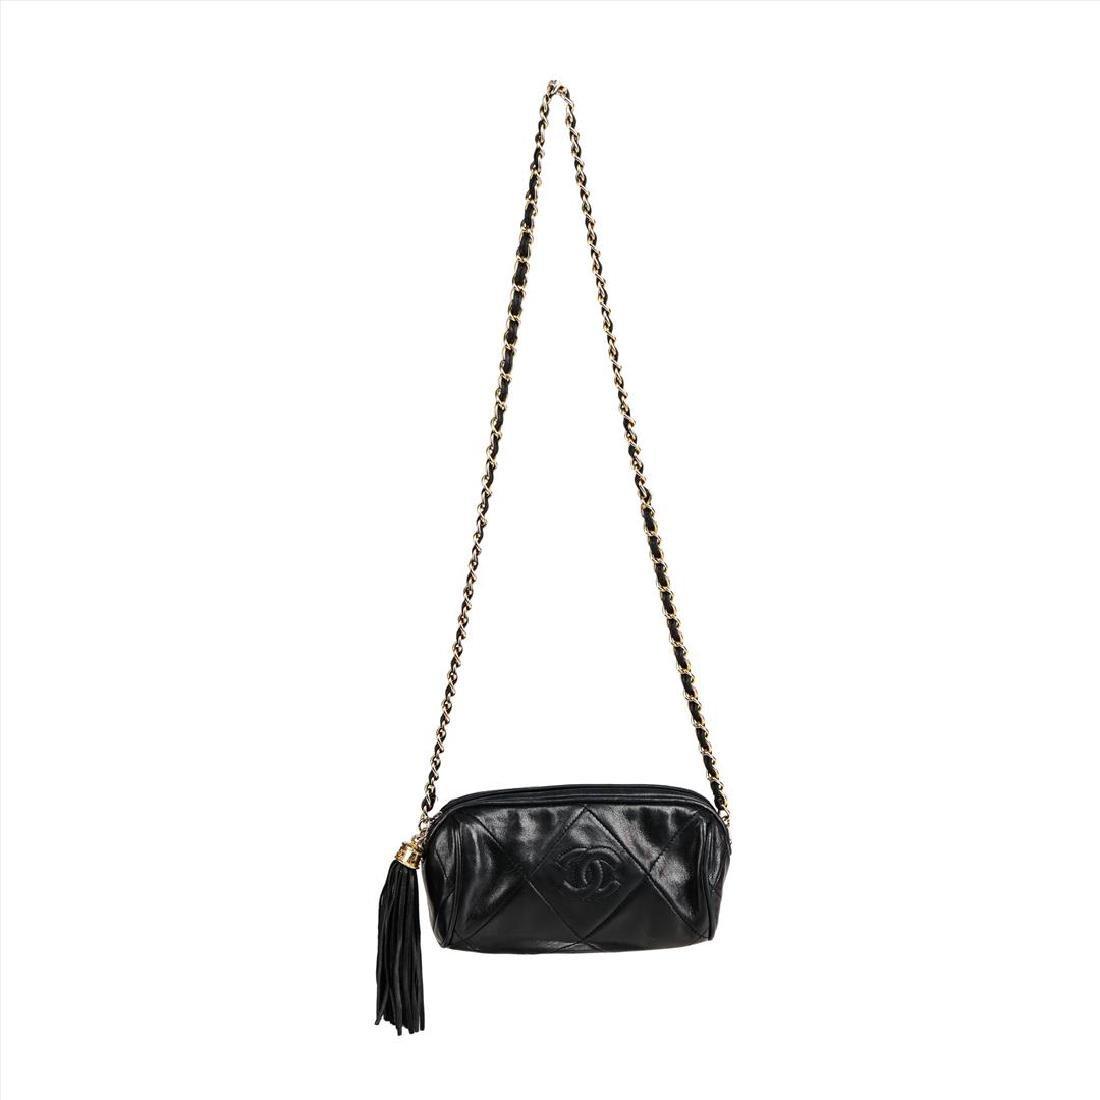 Vintage Chanel Crossbody Evening Bag